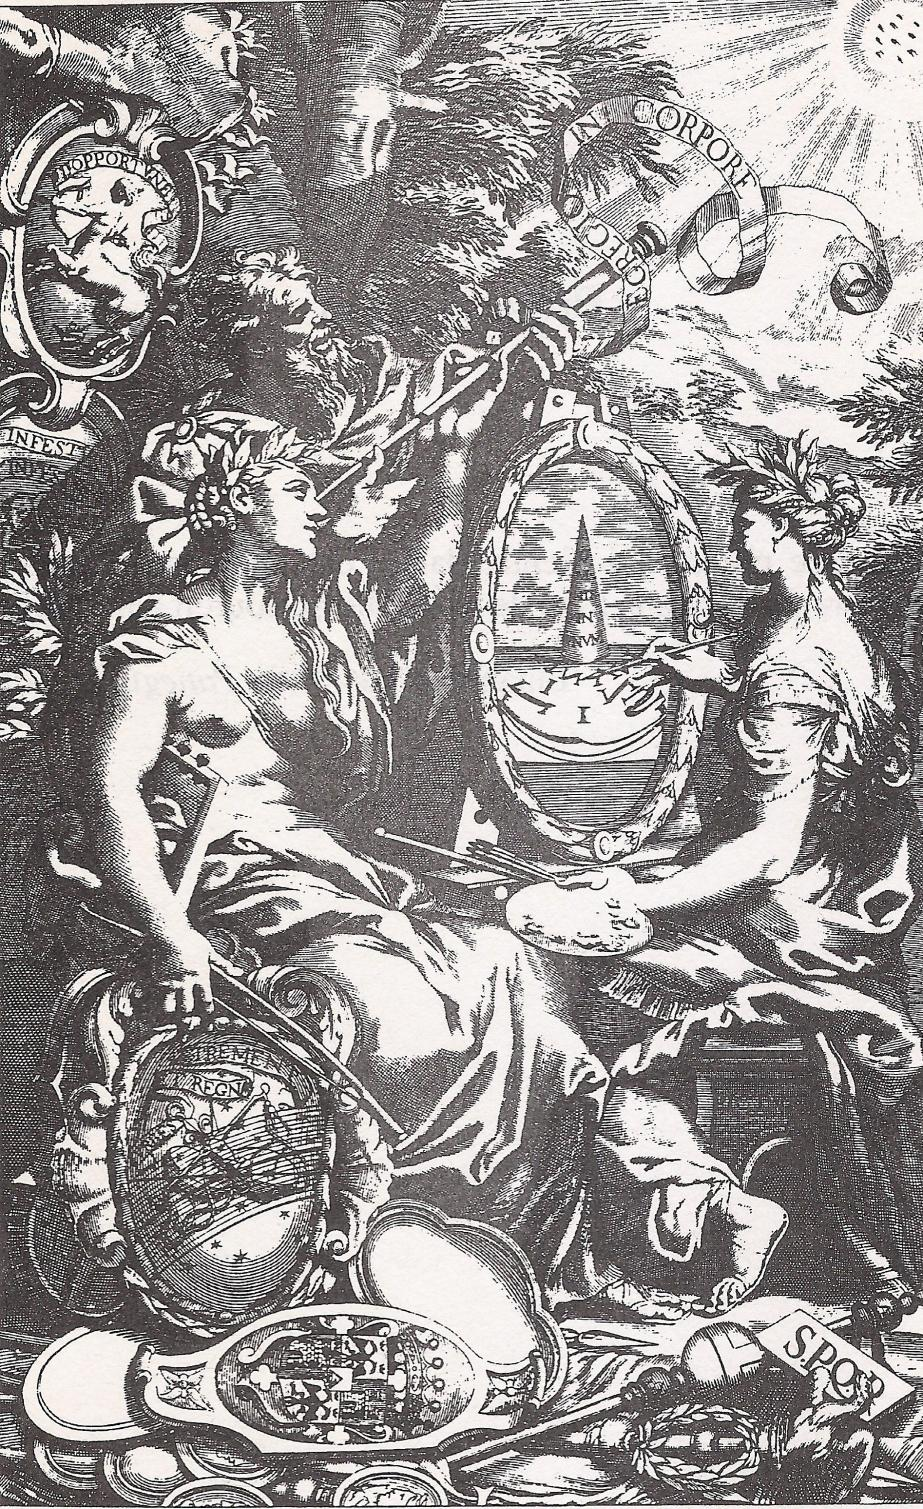 Emanuele_Tesauro_(Frontispice_de_l'édition_de_1670) copia